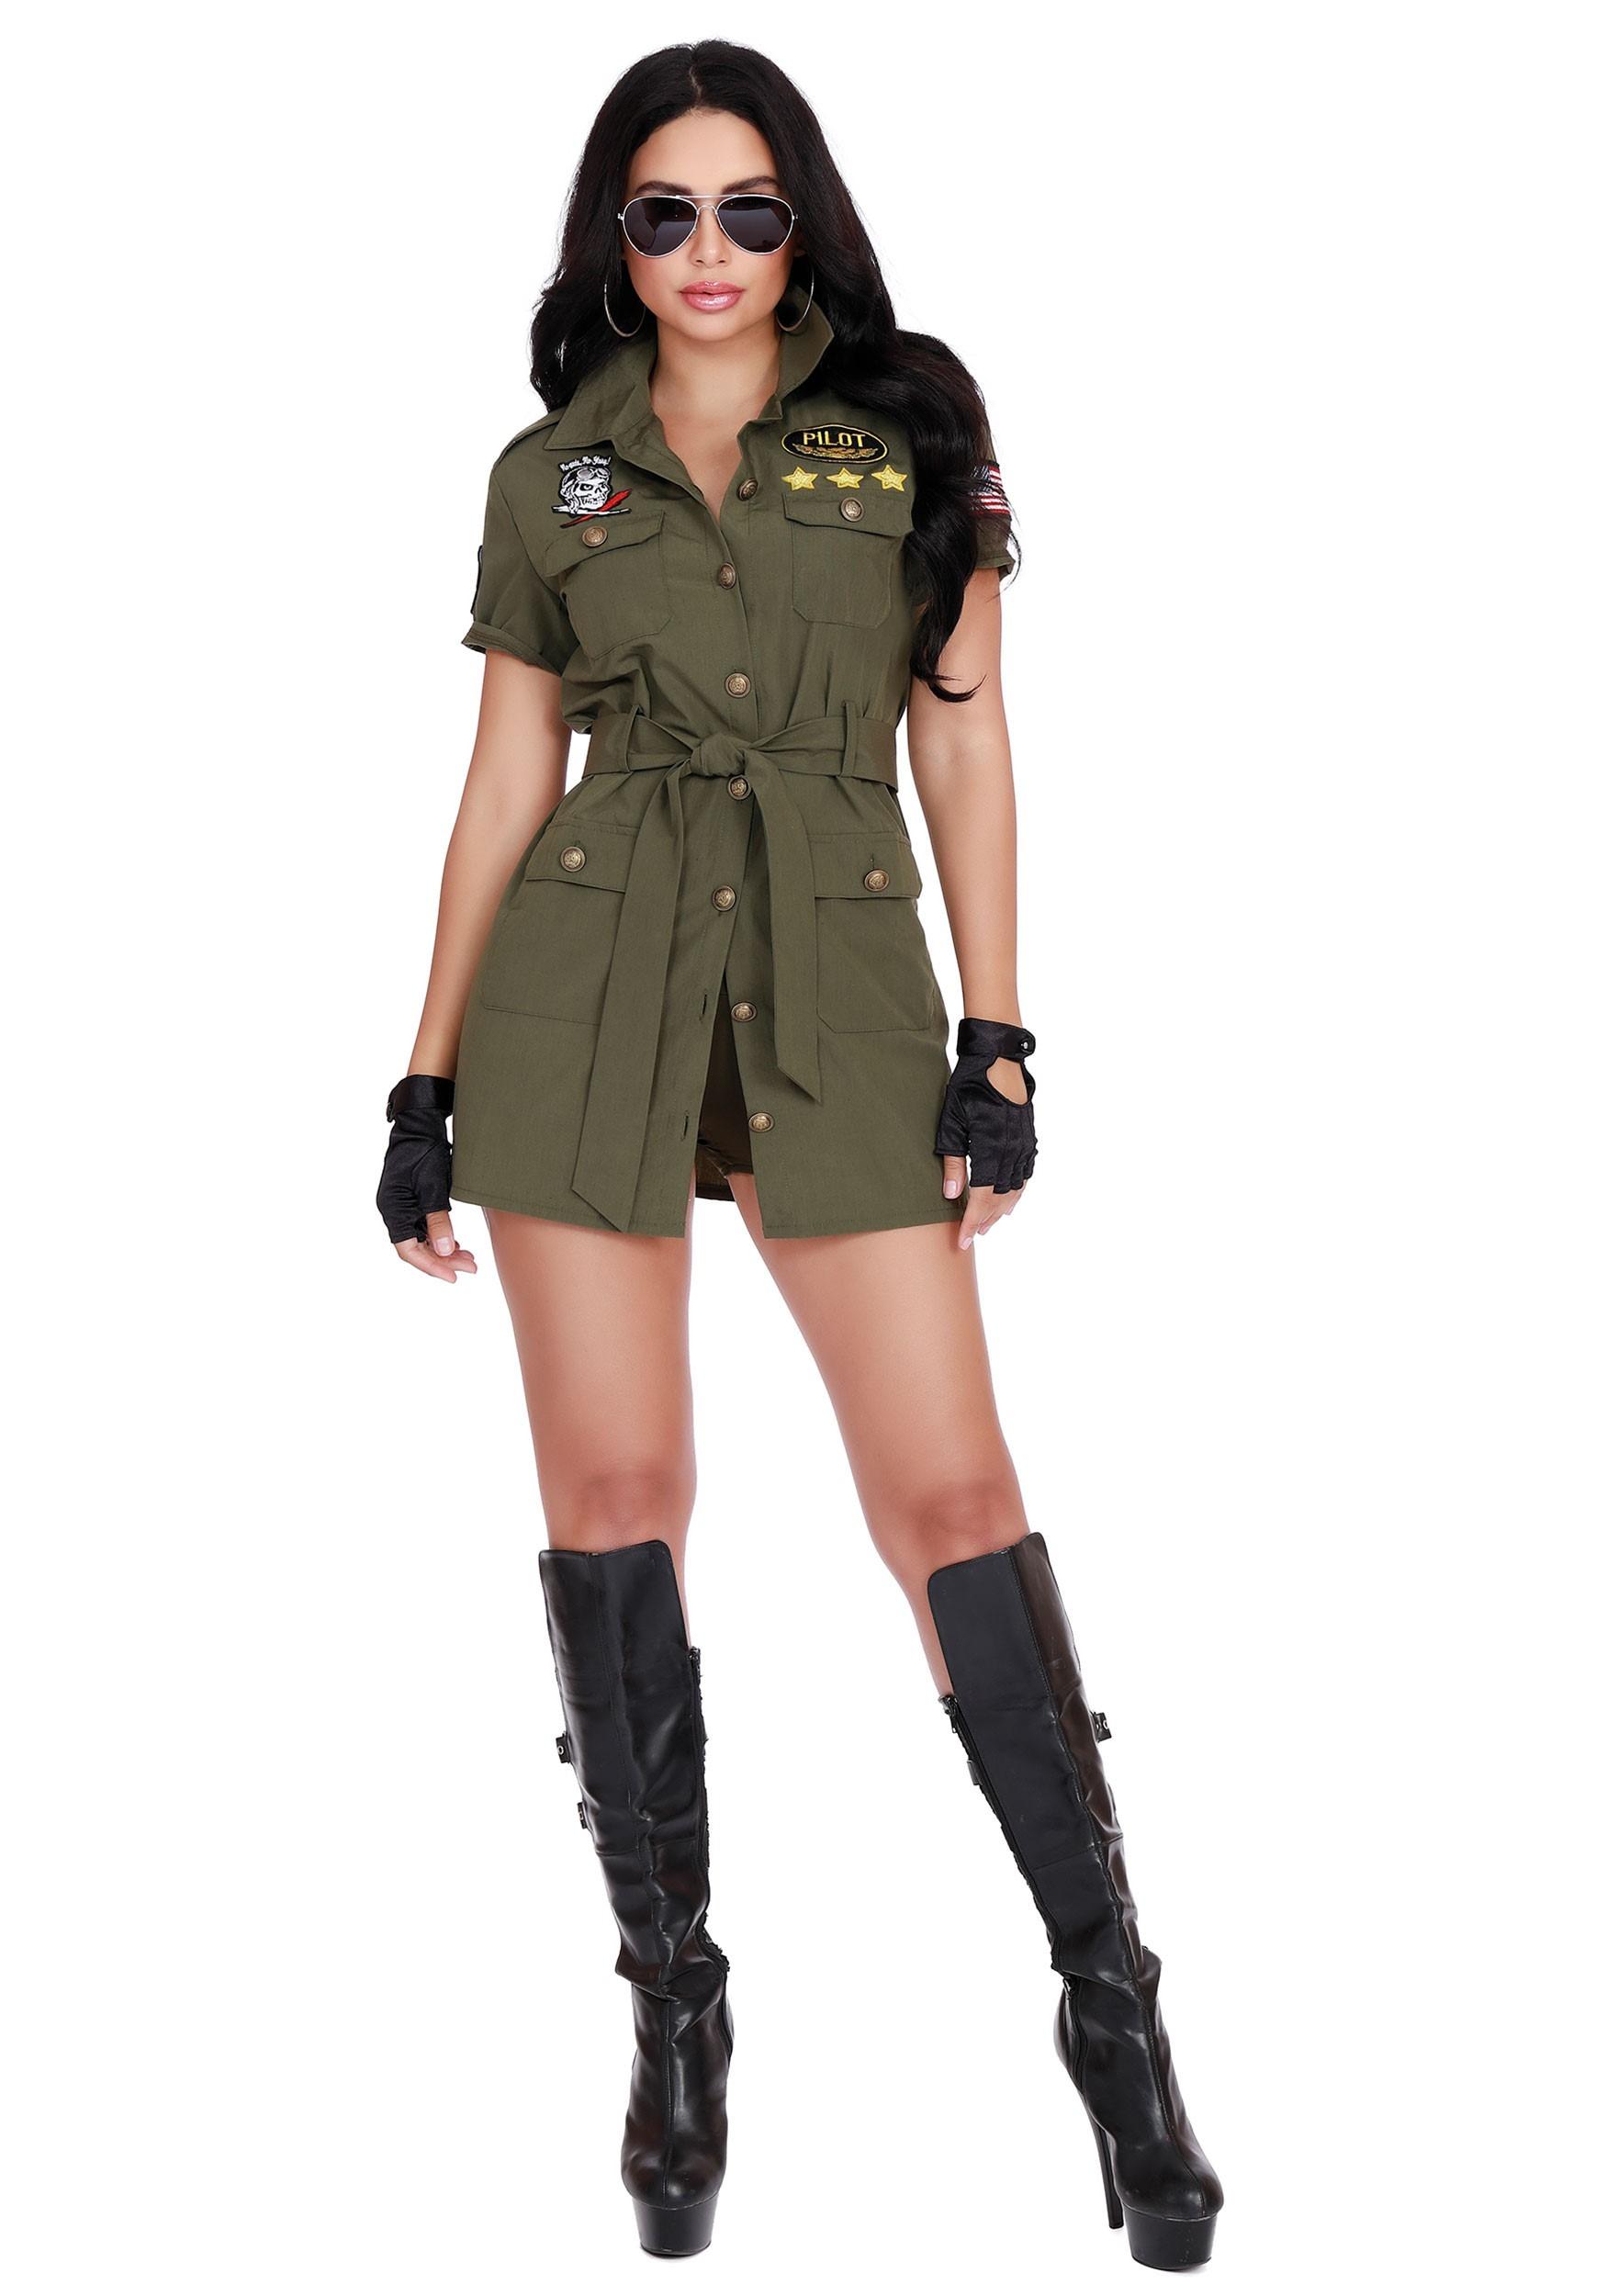 Women's Fighter Pilot Costume